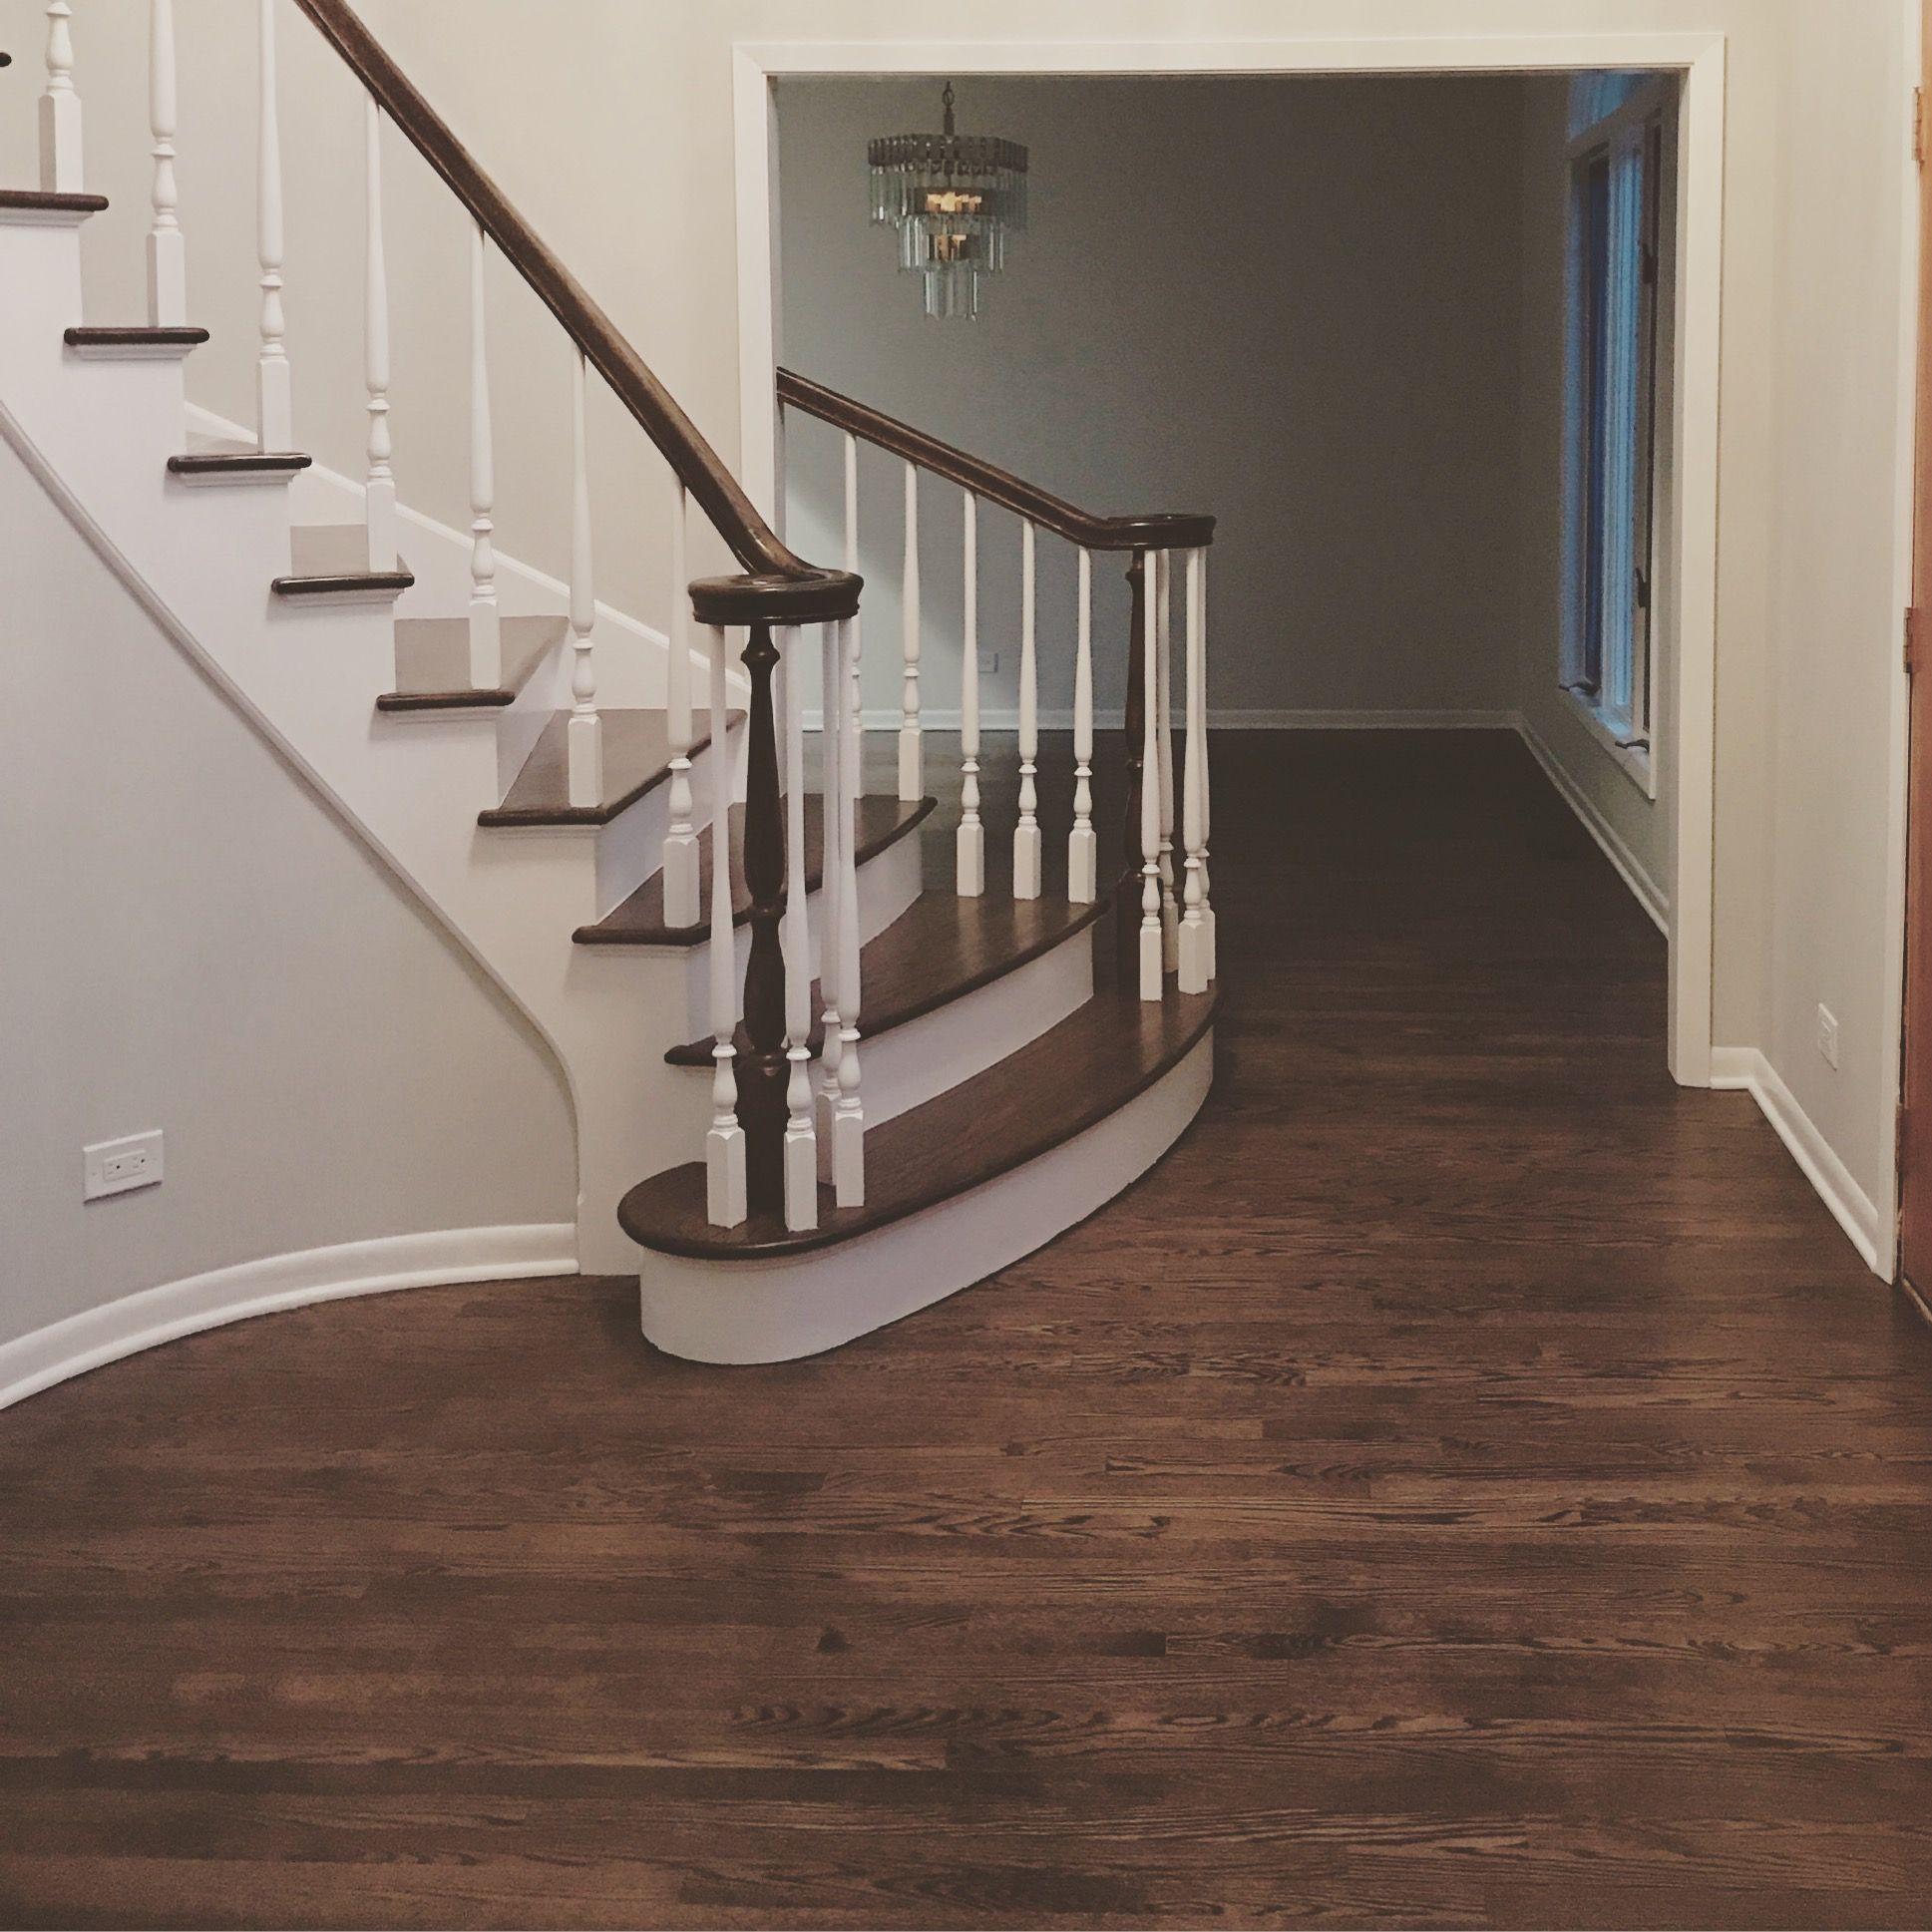 2 1 4 engineered hardwood flooring of new solid 2 1 4 red oak hardwood floors refinished with one coat of throughout new solid 2 1 4 red oak hardwood floors refinished with one coat of dark